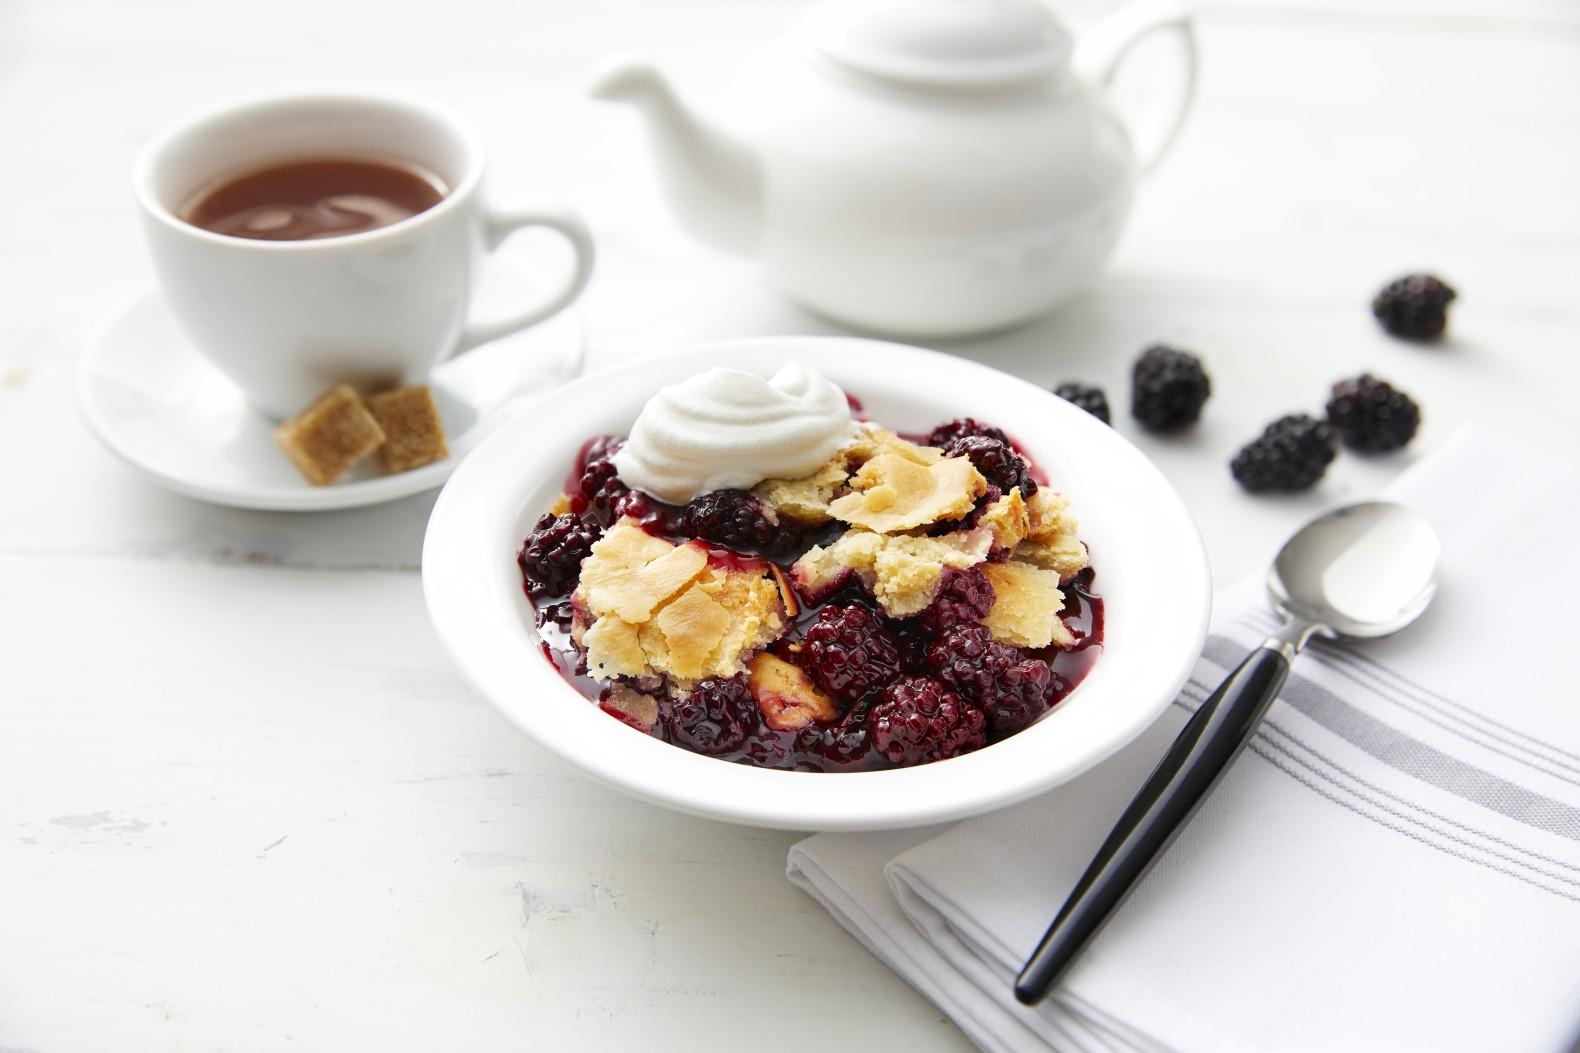 mrs_smith_s_6_lb_buffet_style_ready_to_bake_blackberry_cobbler-4001471